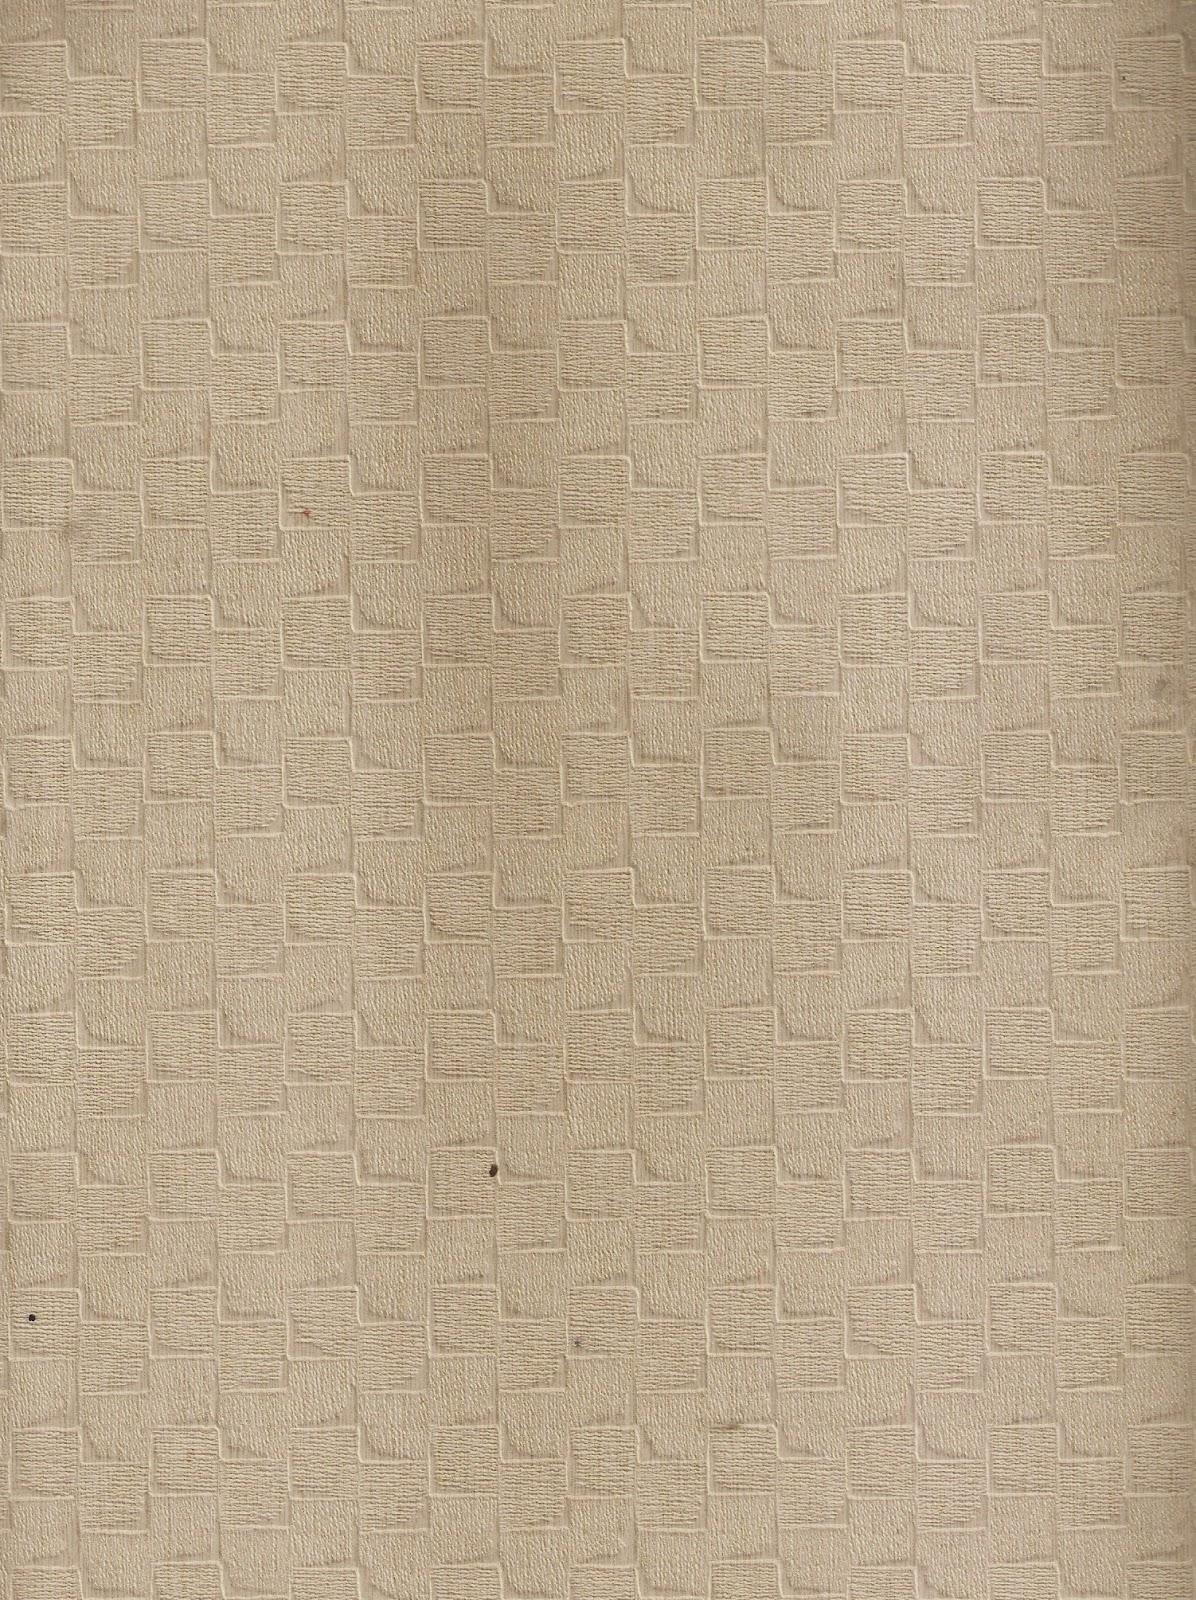 JUAL WALLPAPER DINDING VINYL FLOOR INTERIORBLIND Wallpaper Tembok